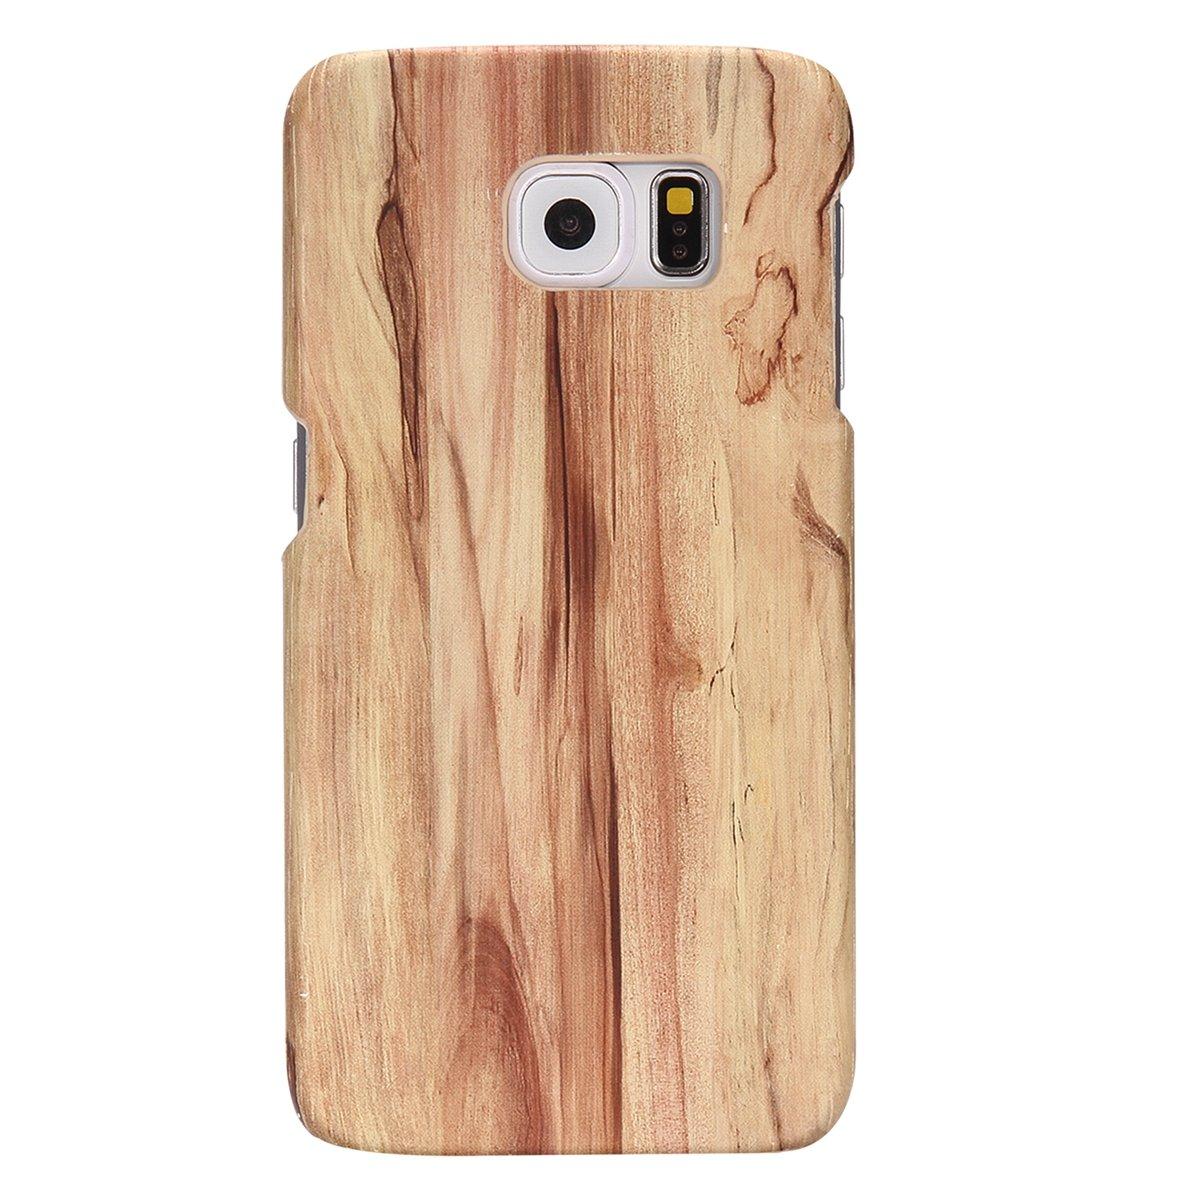 Samsung S6/Funda Madera Slim Luxury/ /Carcasa r/ígida con PC Plastic Back Madera Cover n-incomparable duraderas fina Madera mobile Bumper Samsung S6/Funda felfy m/óvil para Samsung Galaxy S6 Galaxy S6/Wood Case